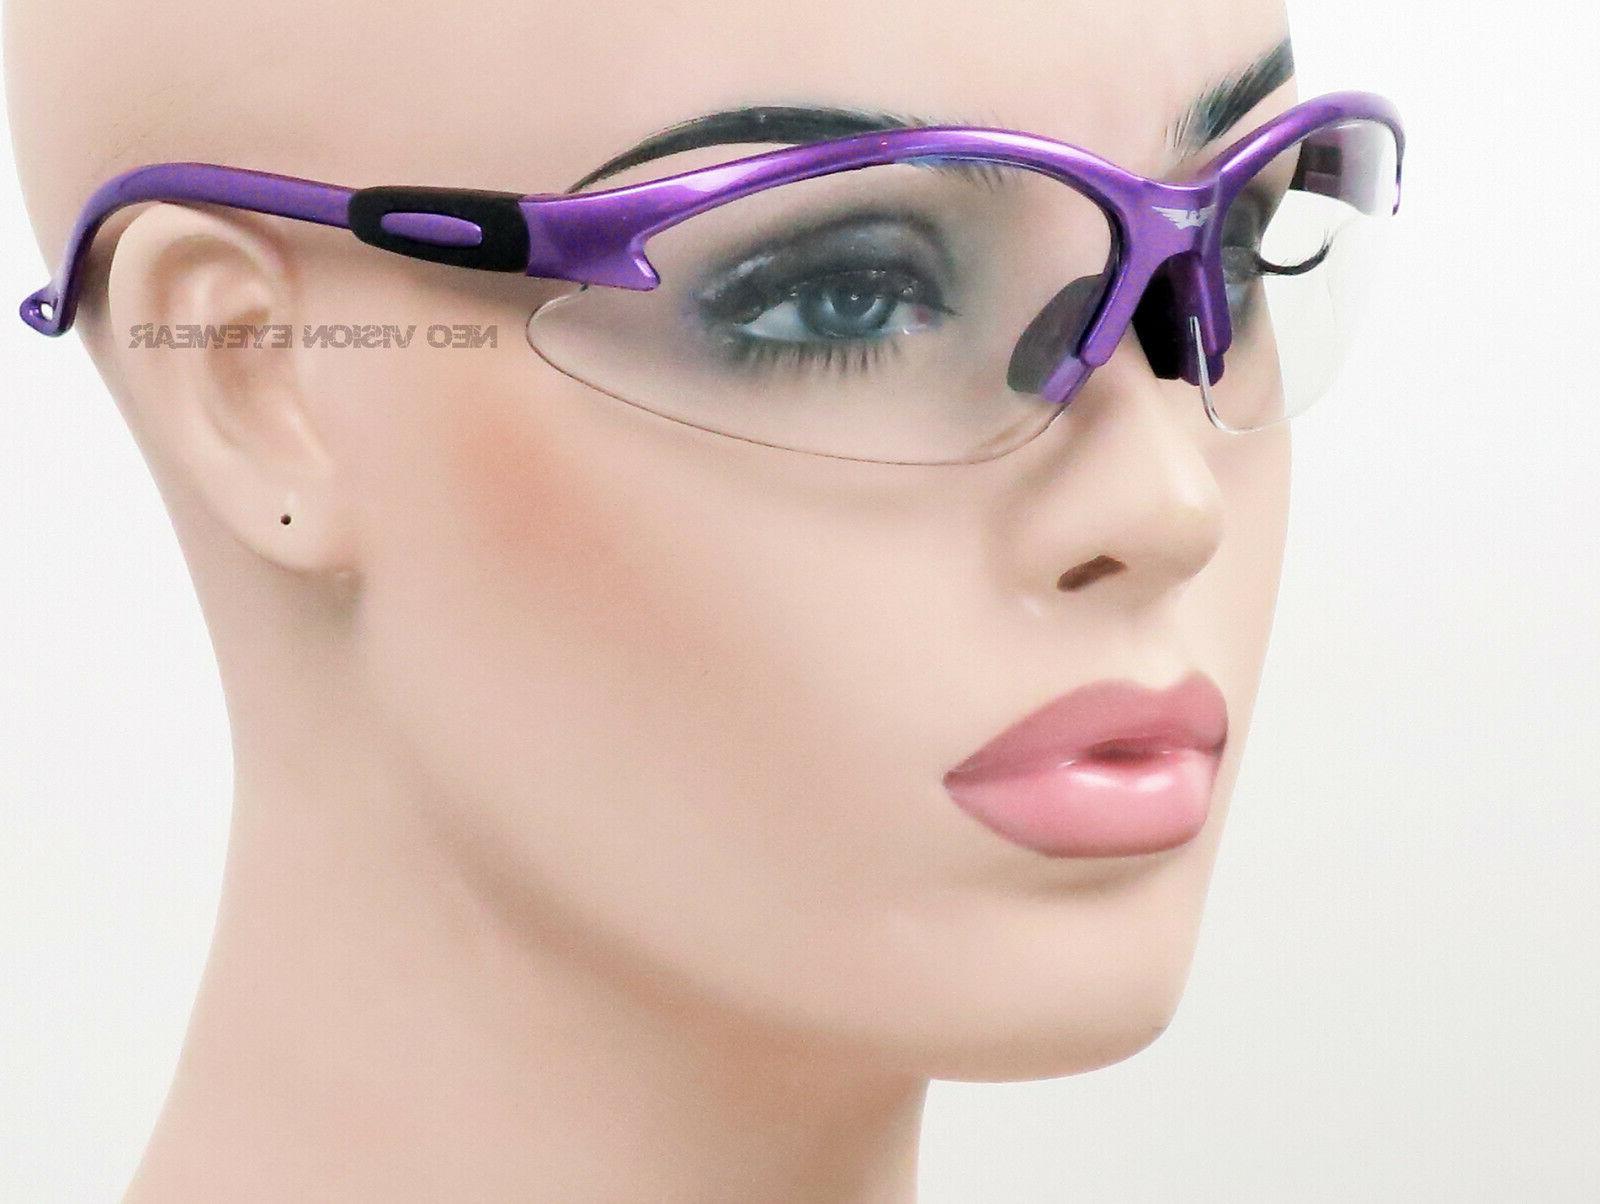 Global Vision Cougar Purple Frame Clear